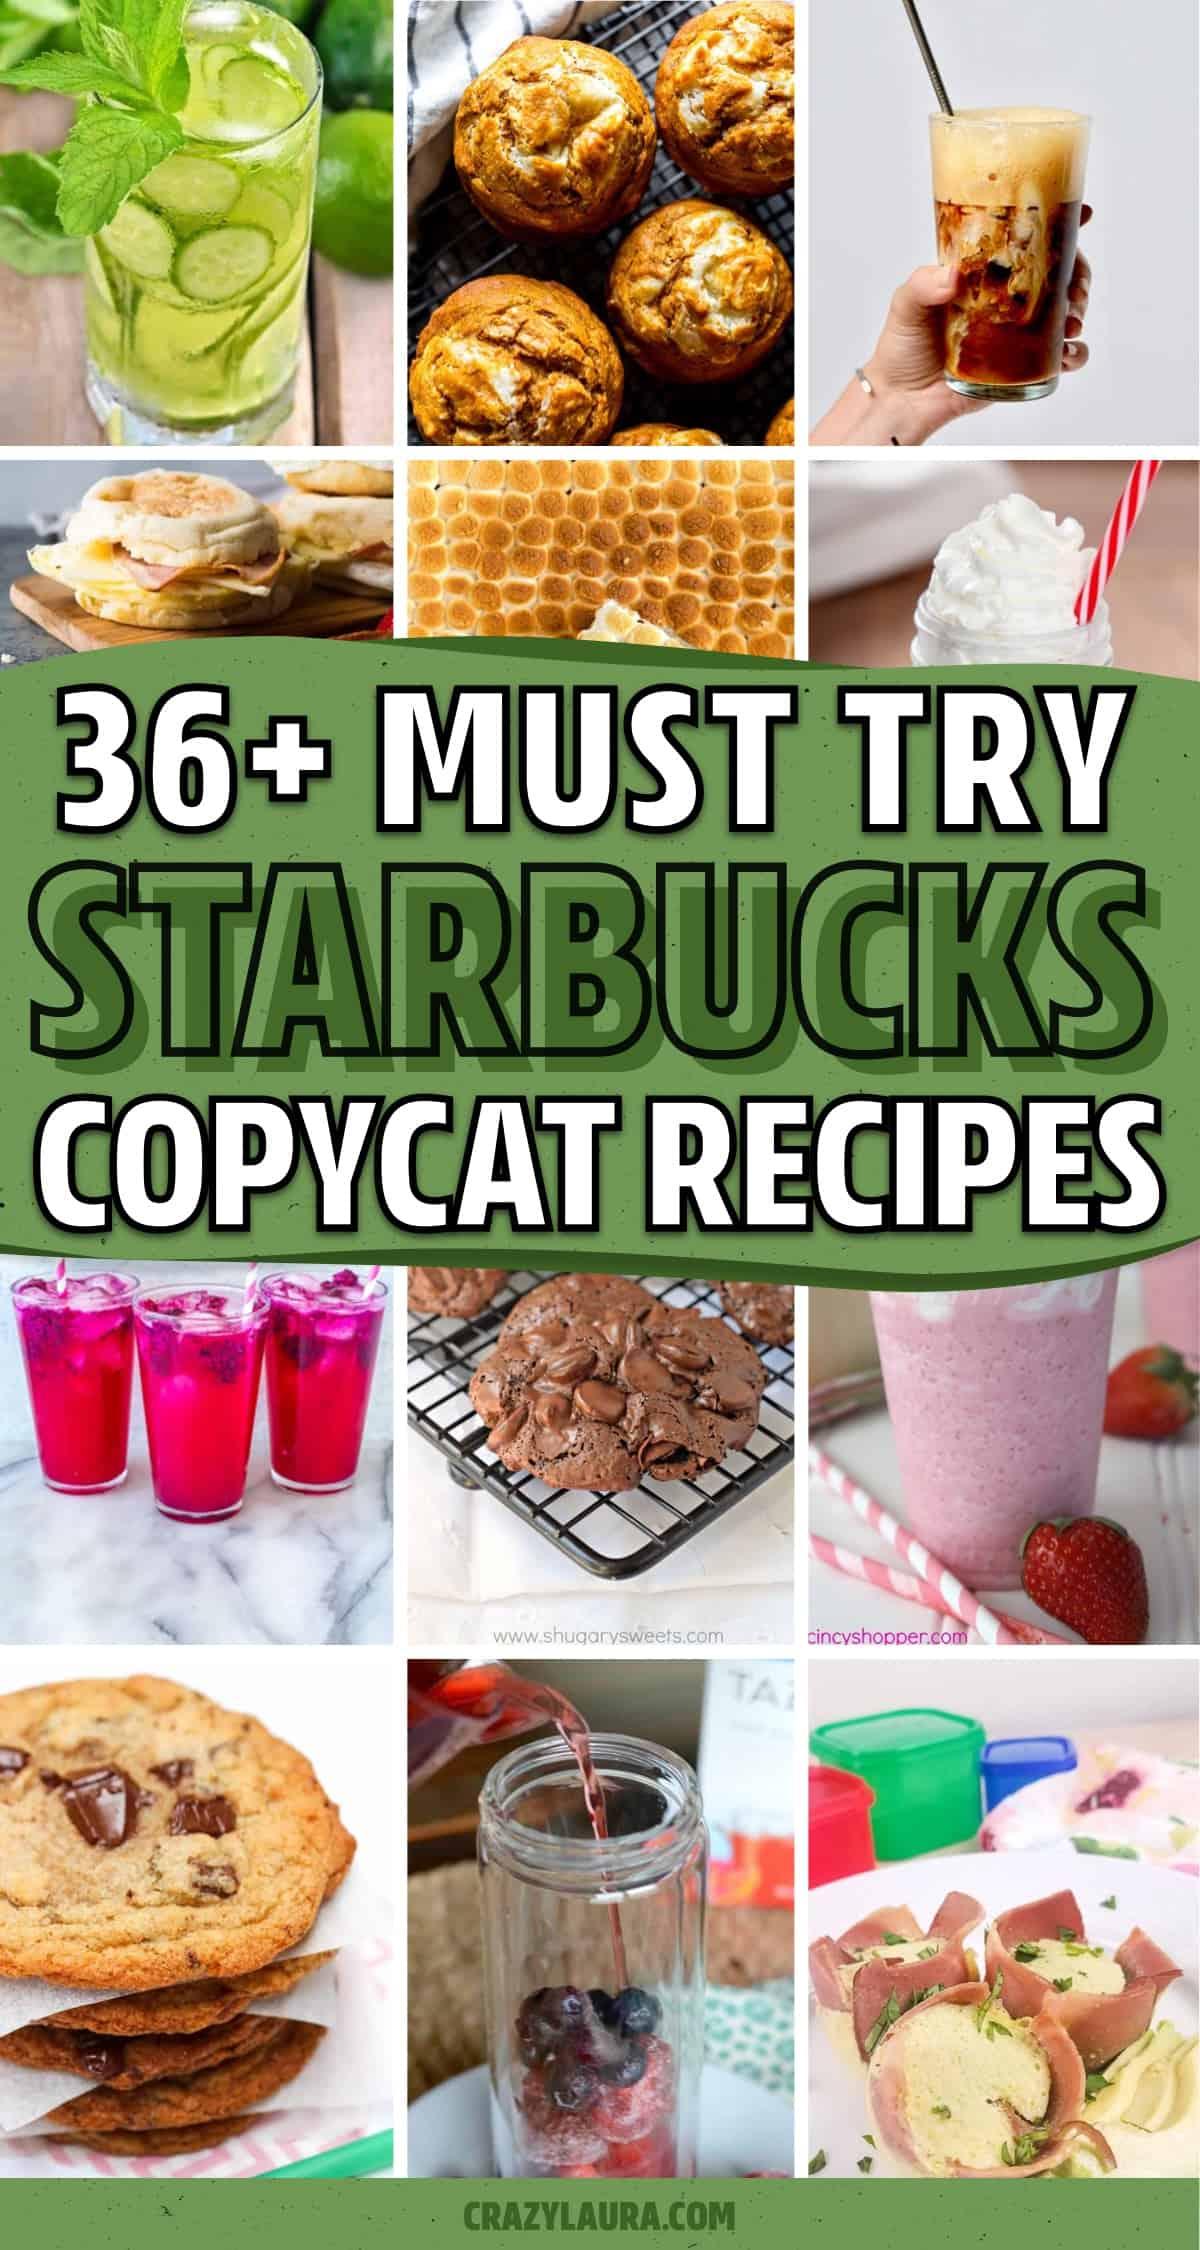 starbucks copycat recipes to try